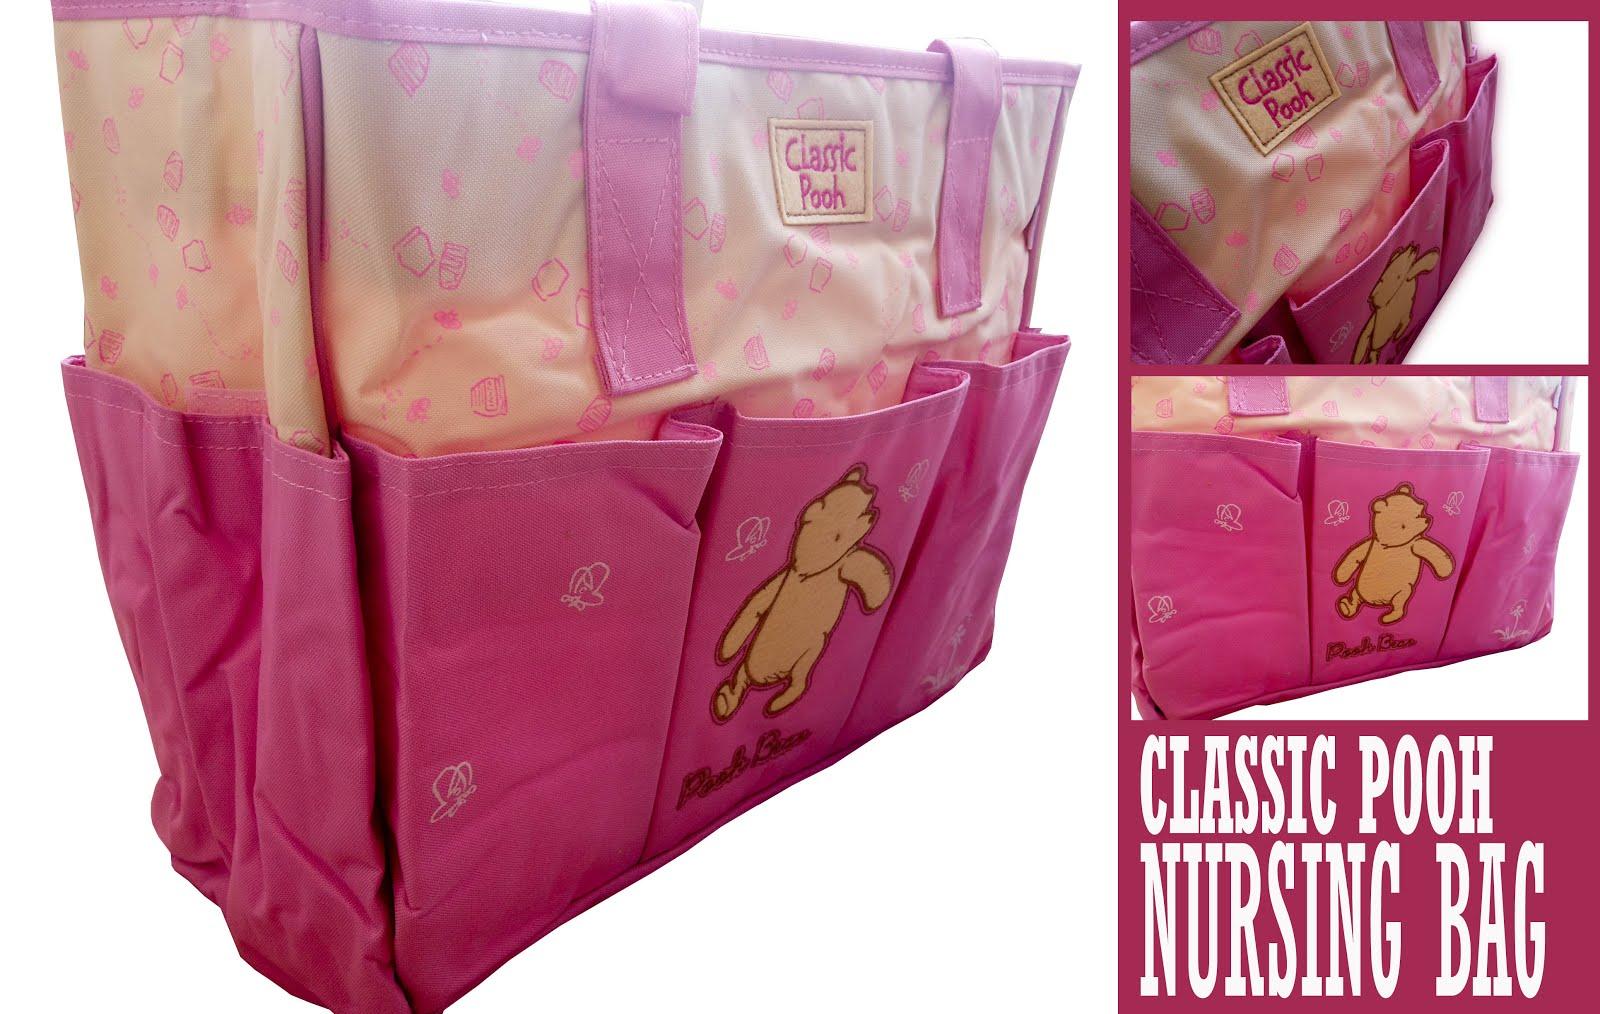 Nursing Bag - Classic Pooh